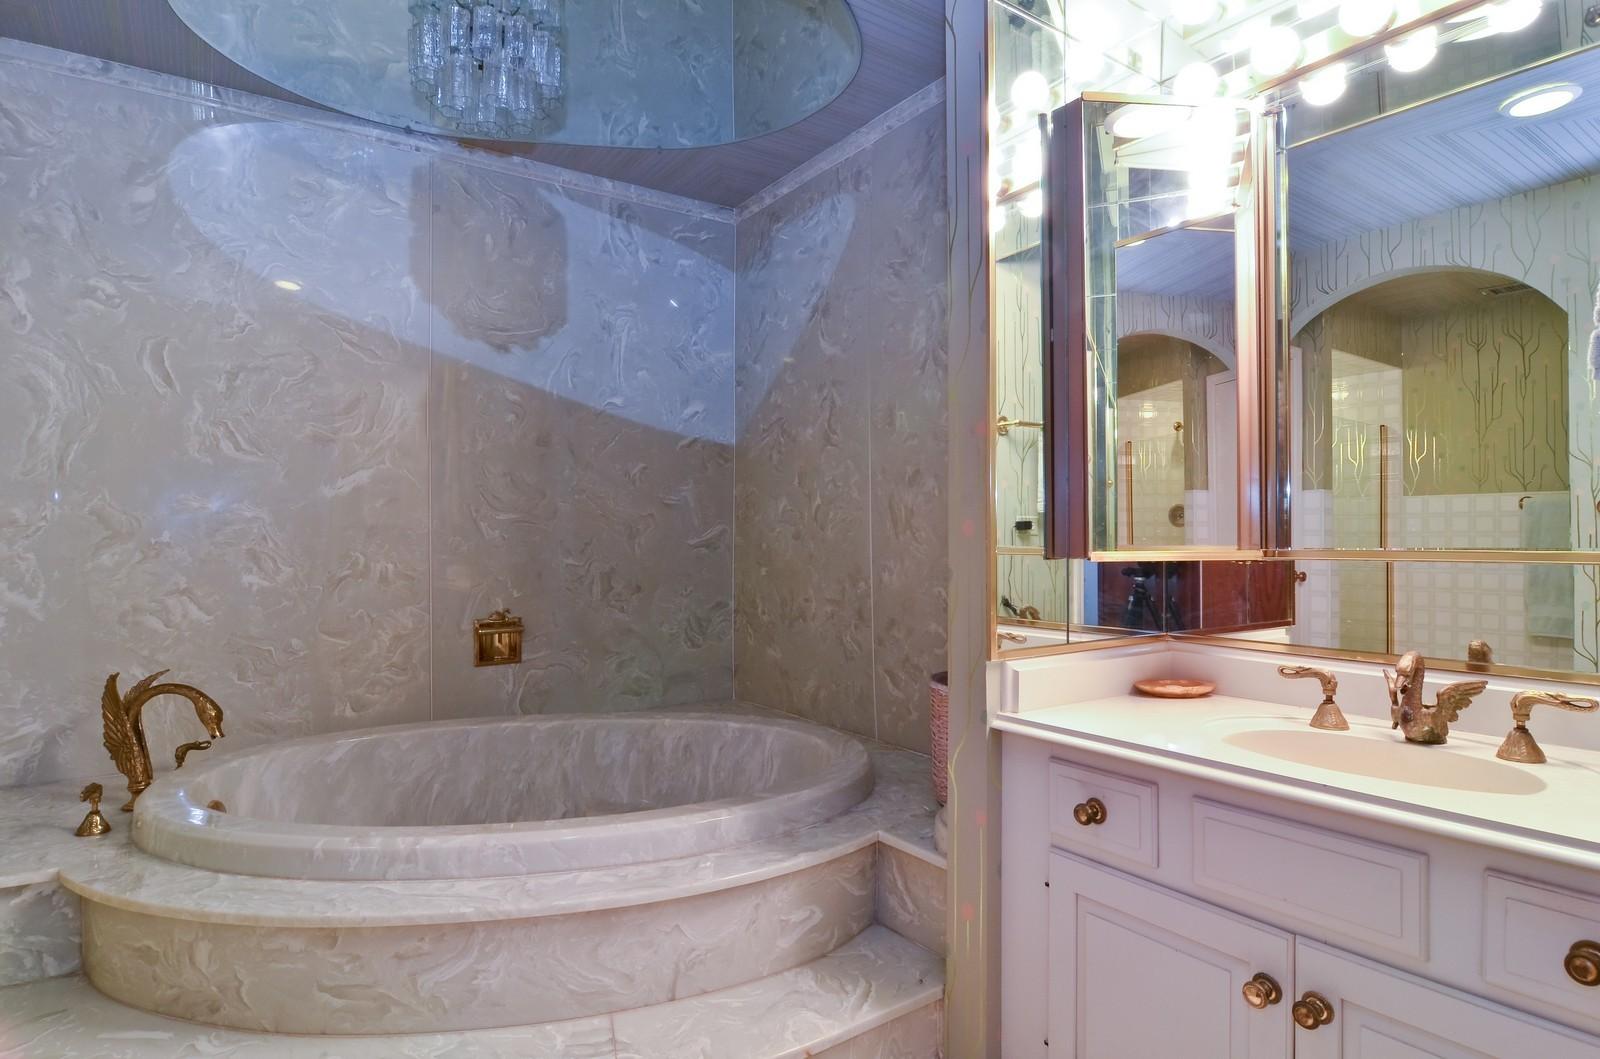 Real Estate Photography - 6450 Cicero, Unit 201, Lincolnwood, IL, 60712 - Master Bathroom